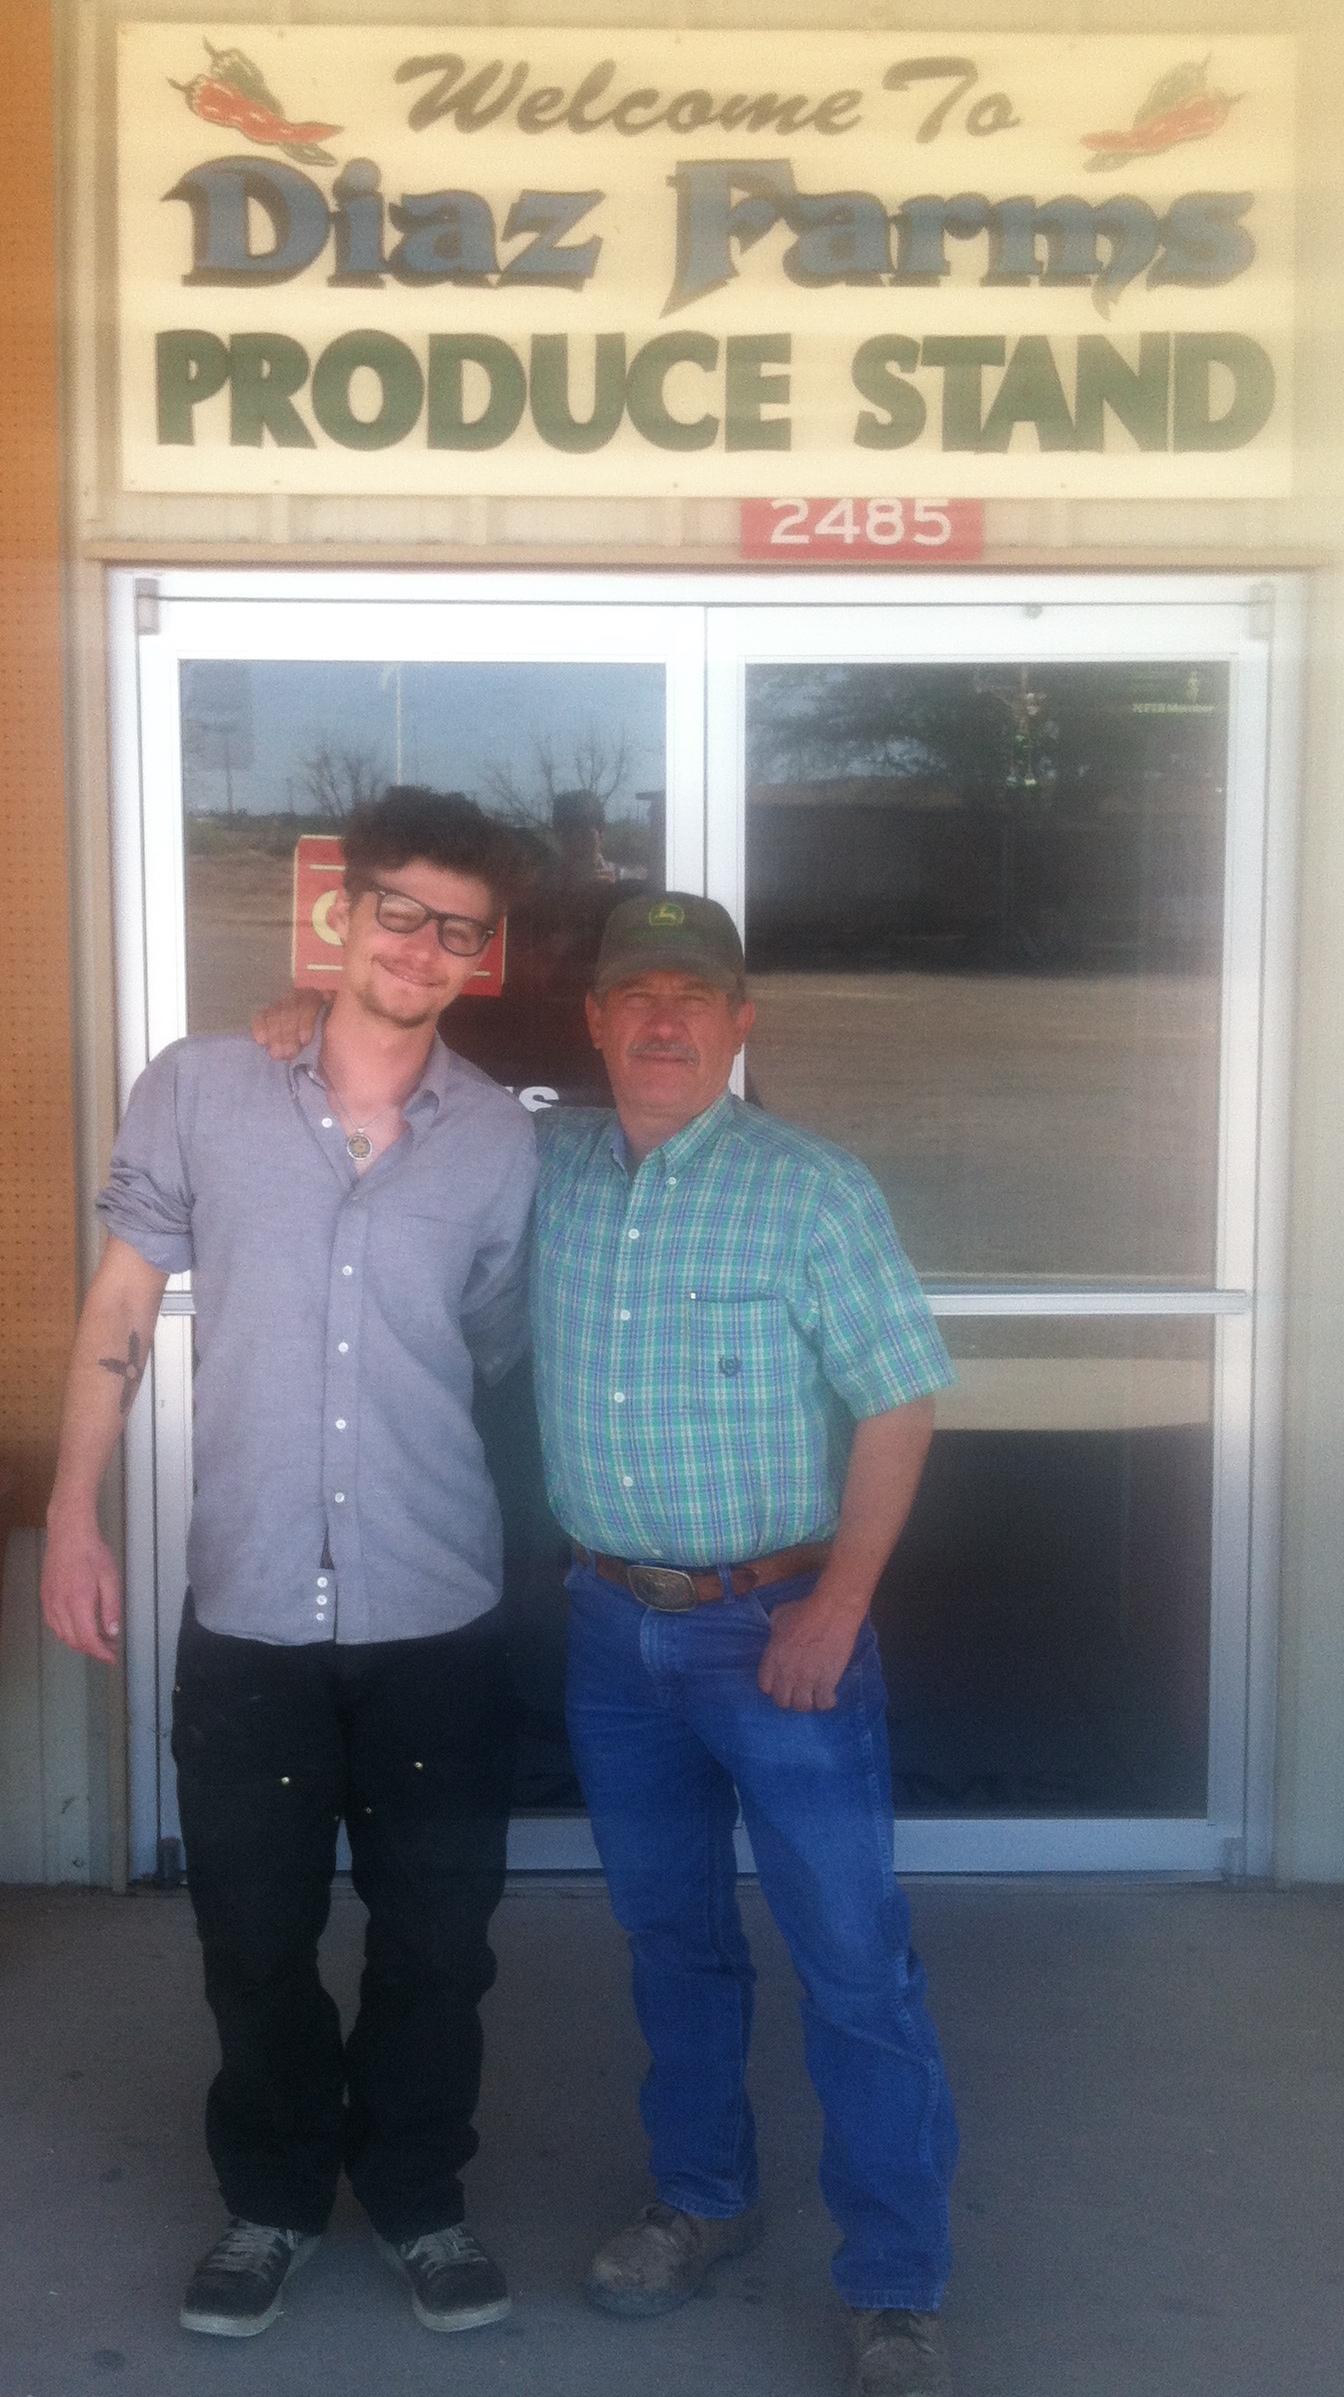 Los Roast's Marshall Berg and Eddie Diaz of Diaz Farms